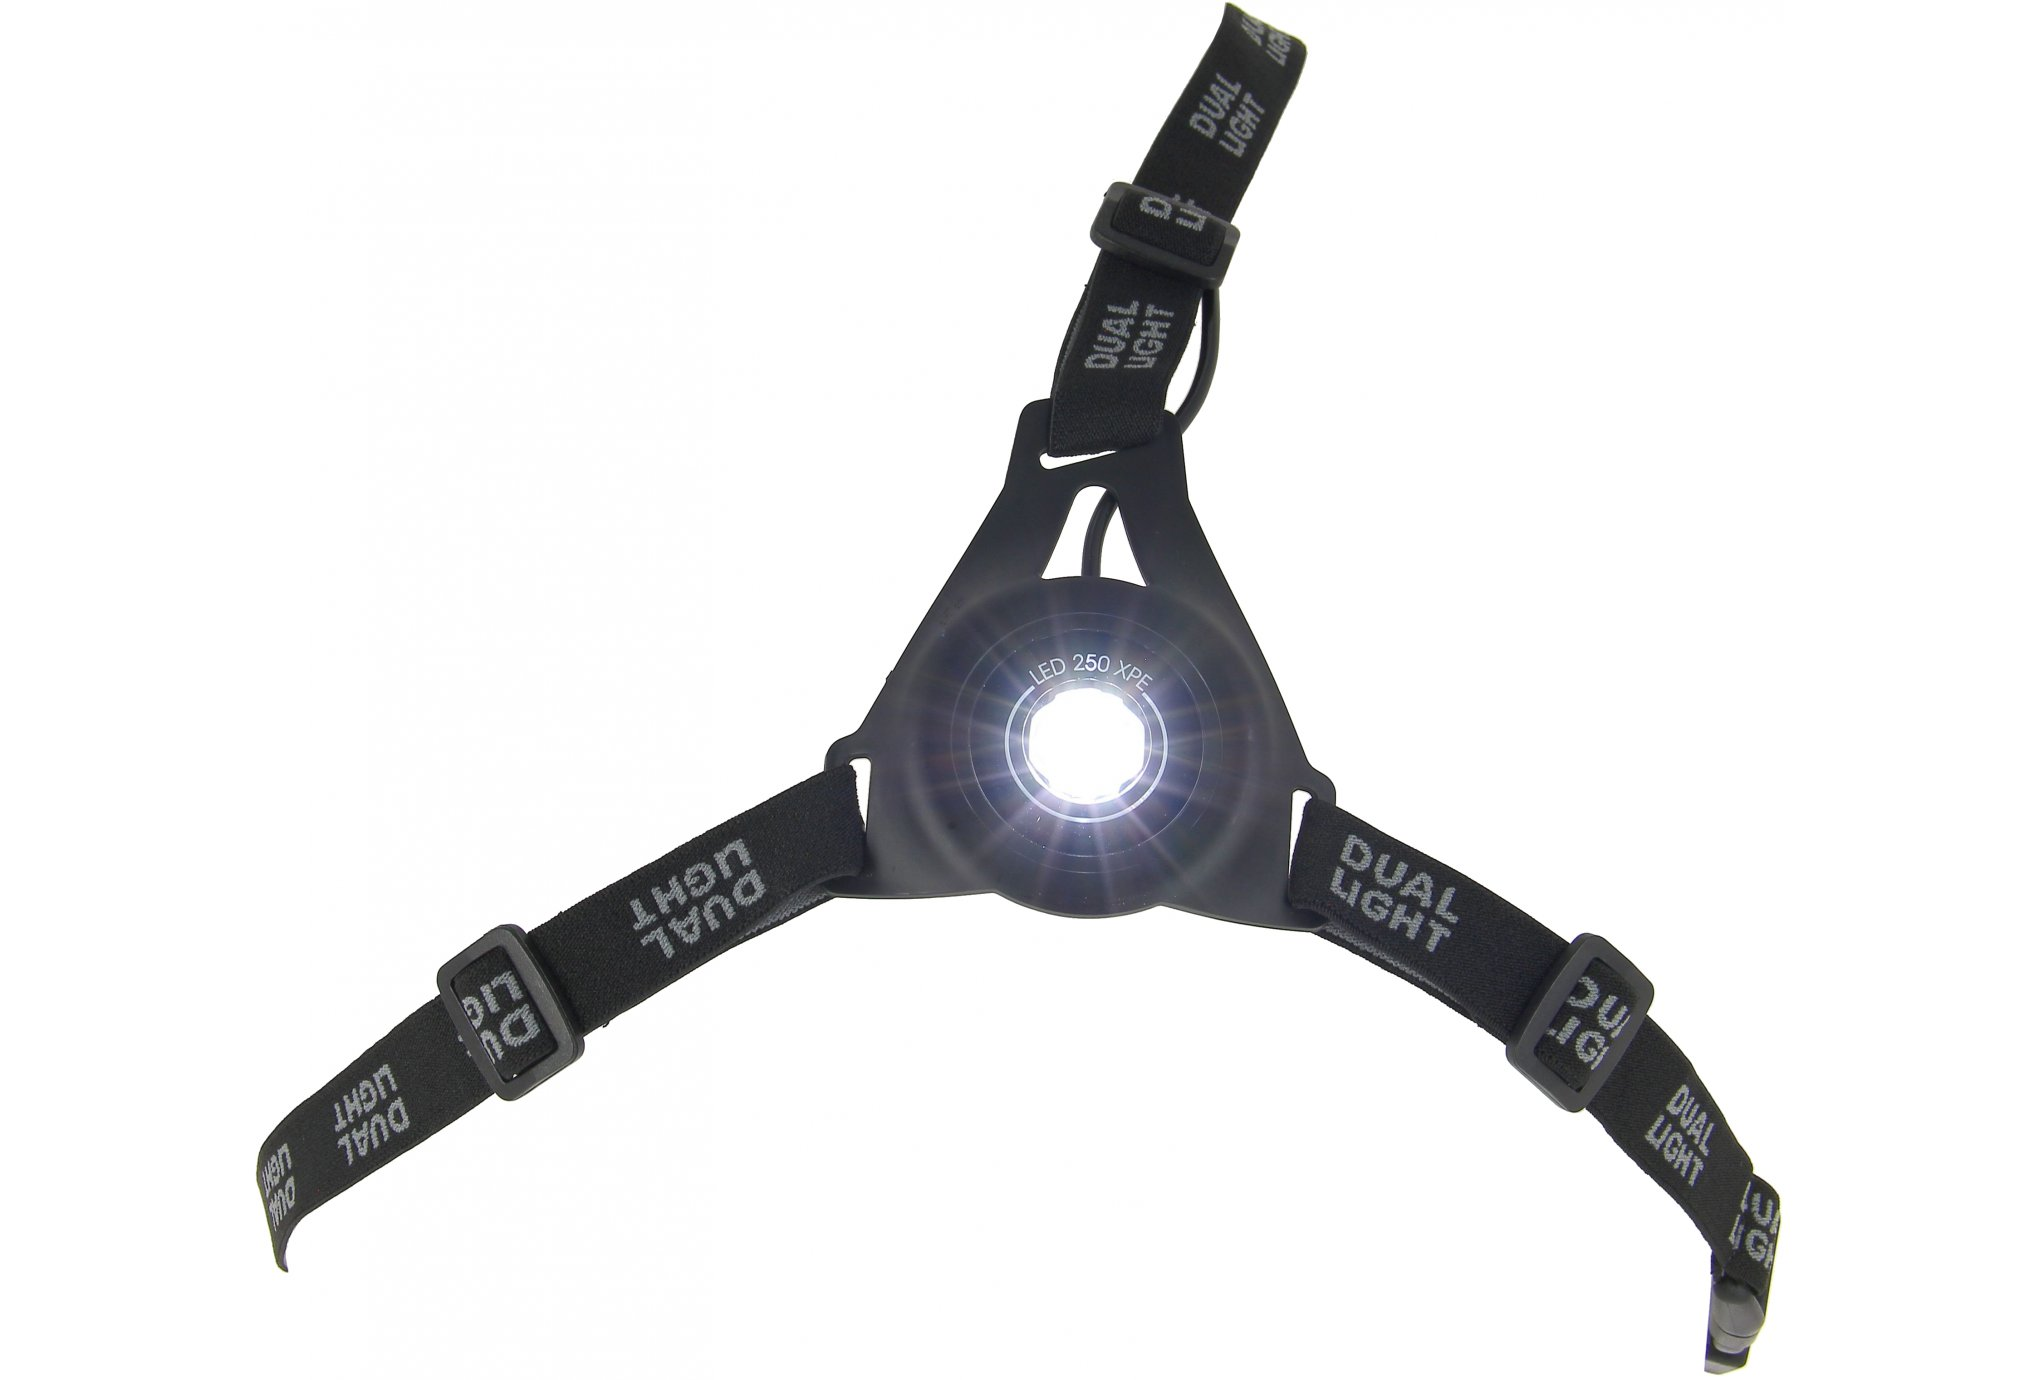 i-run.fr Dual Light Lampe frontale / éclairage